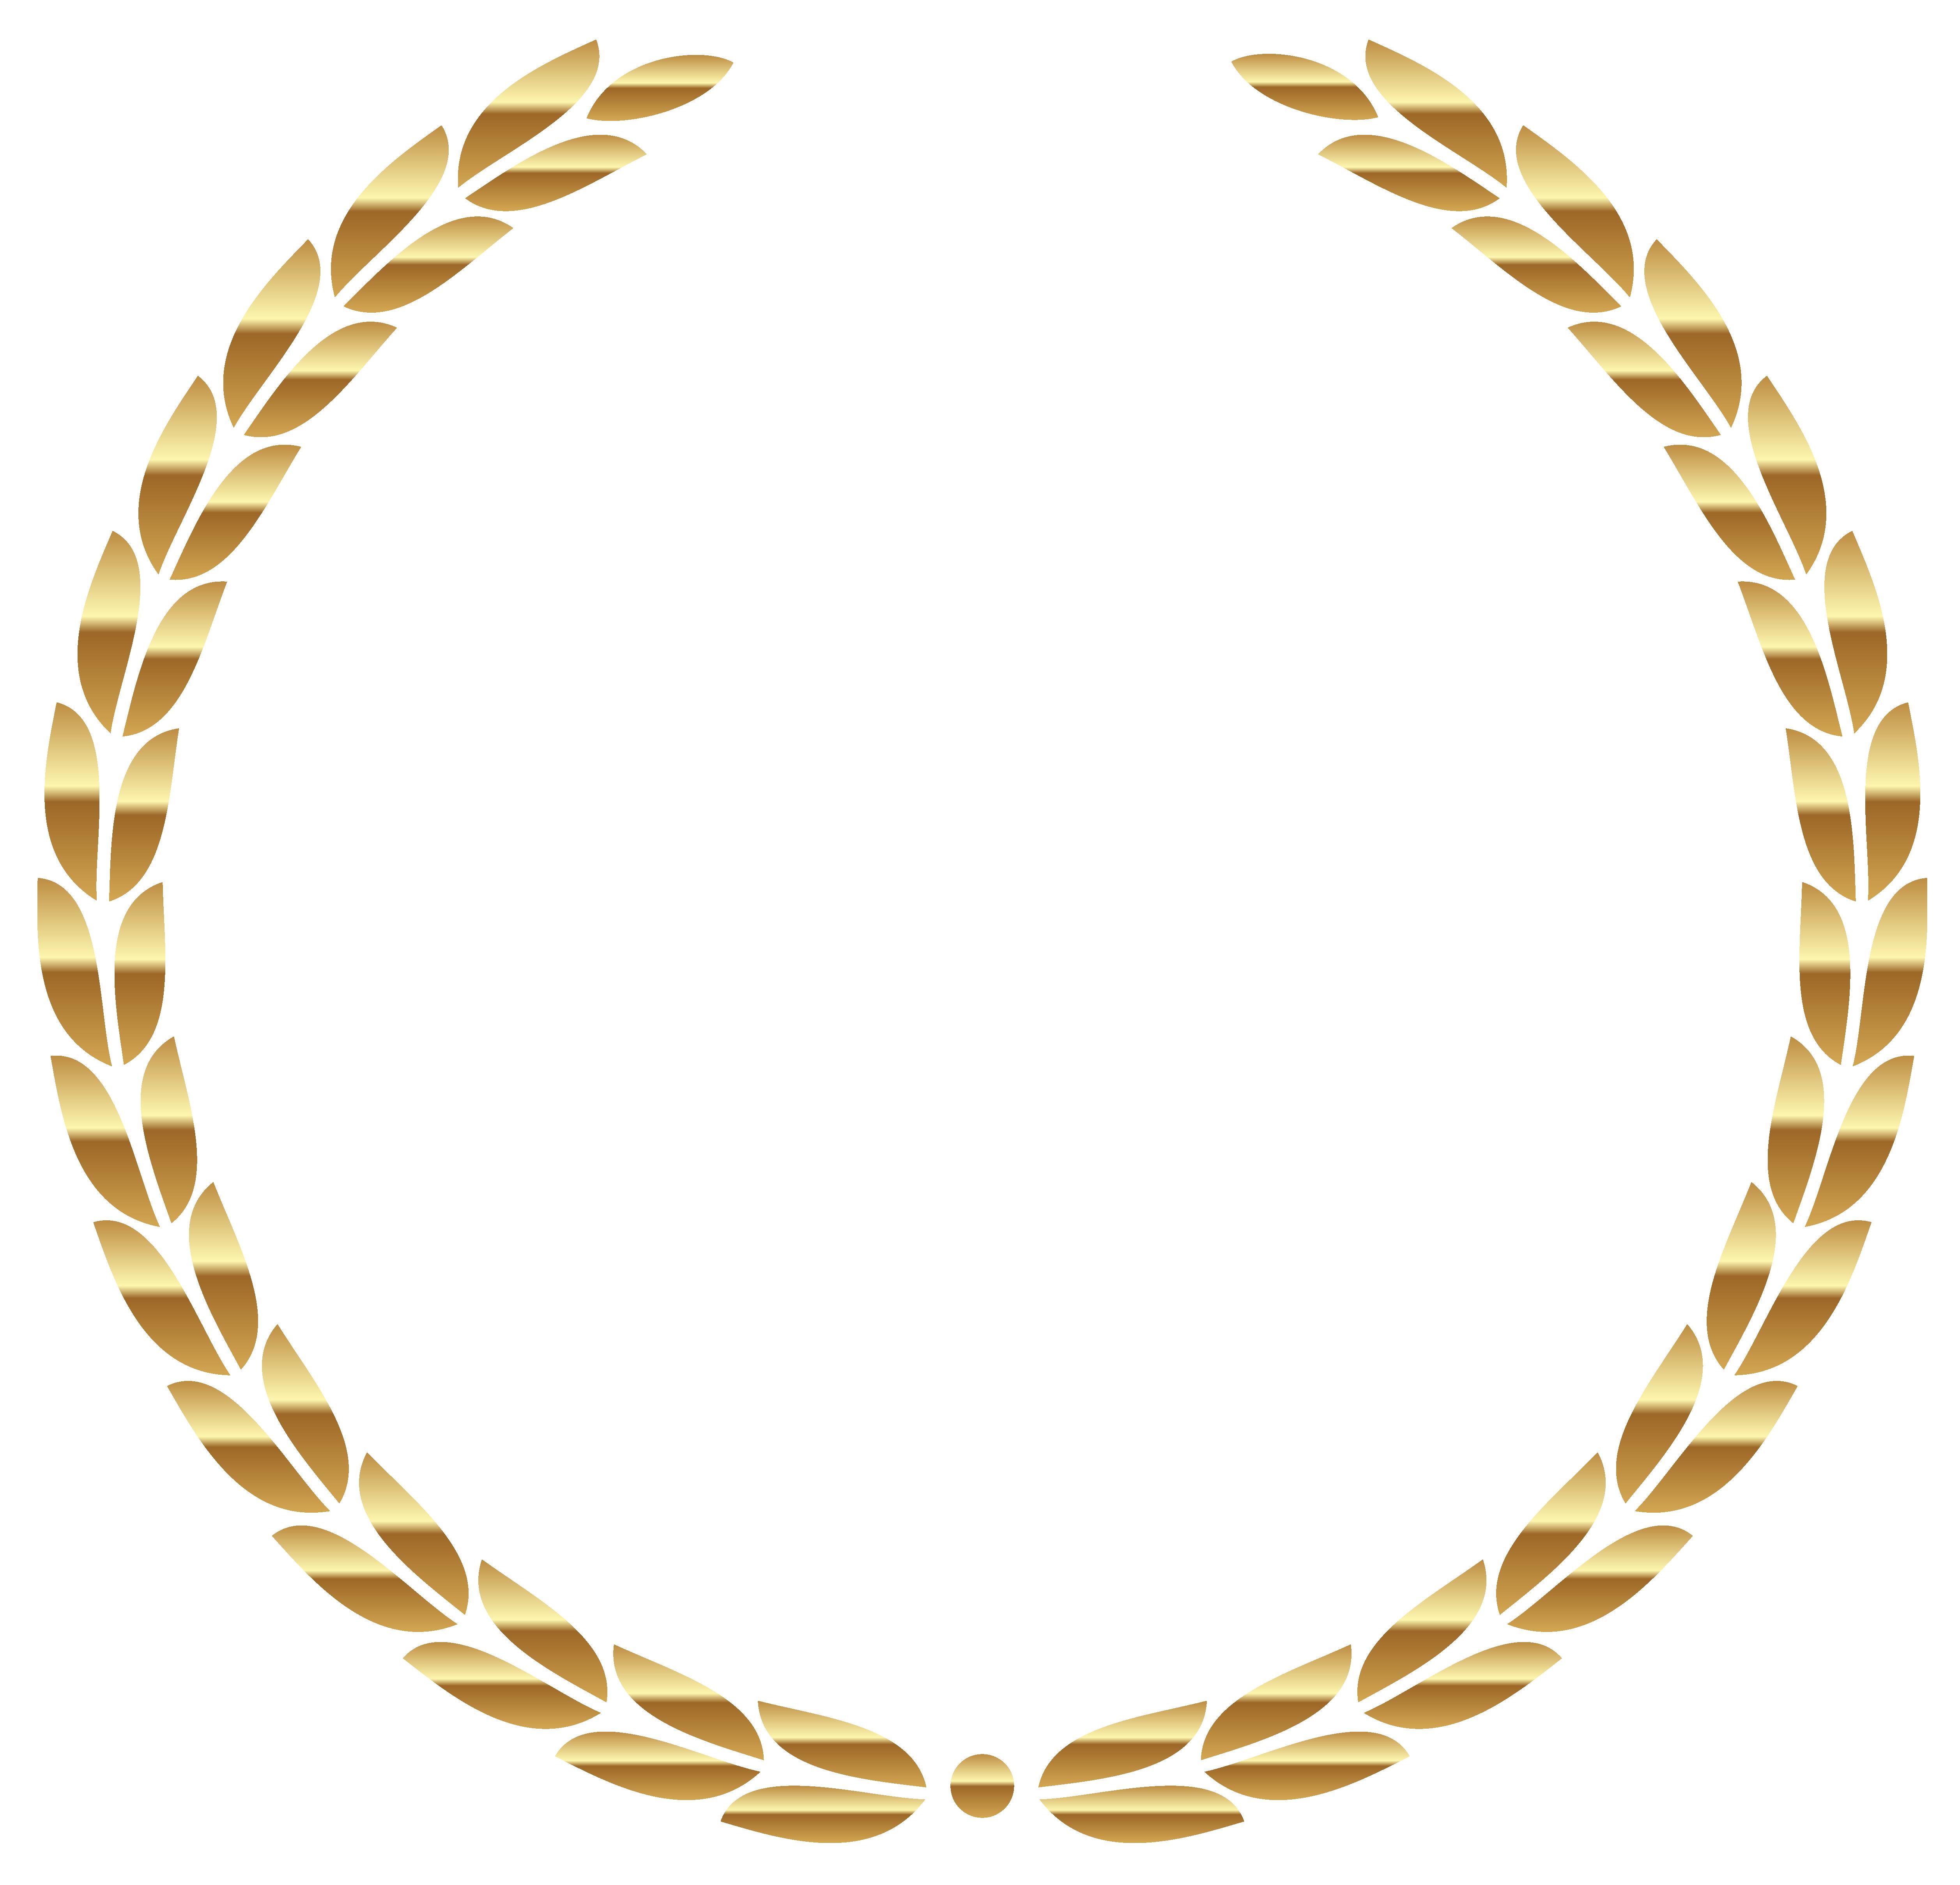 Transparent Gold Wreath Transparent PNG Image.